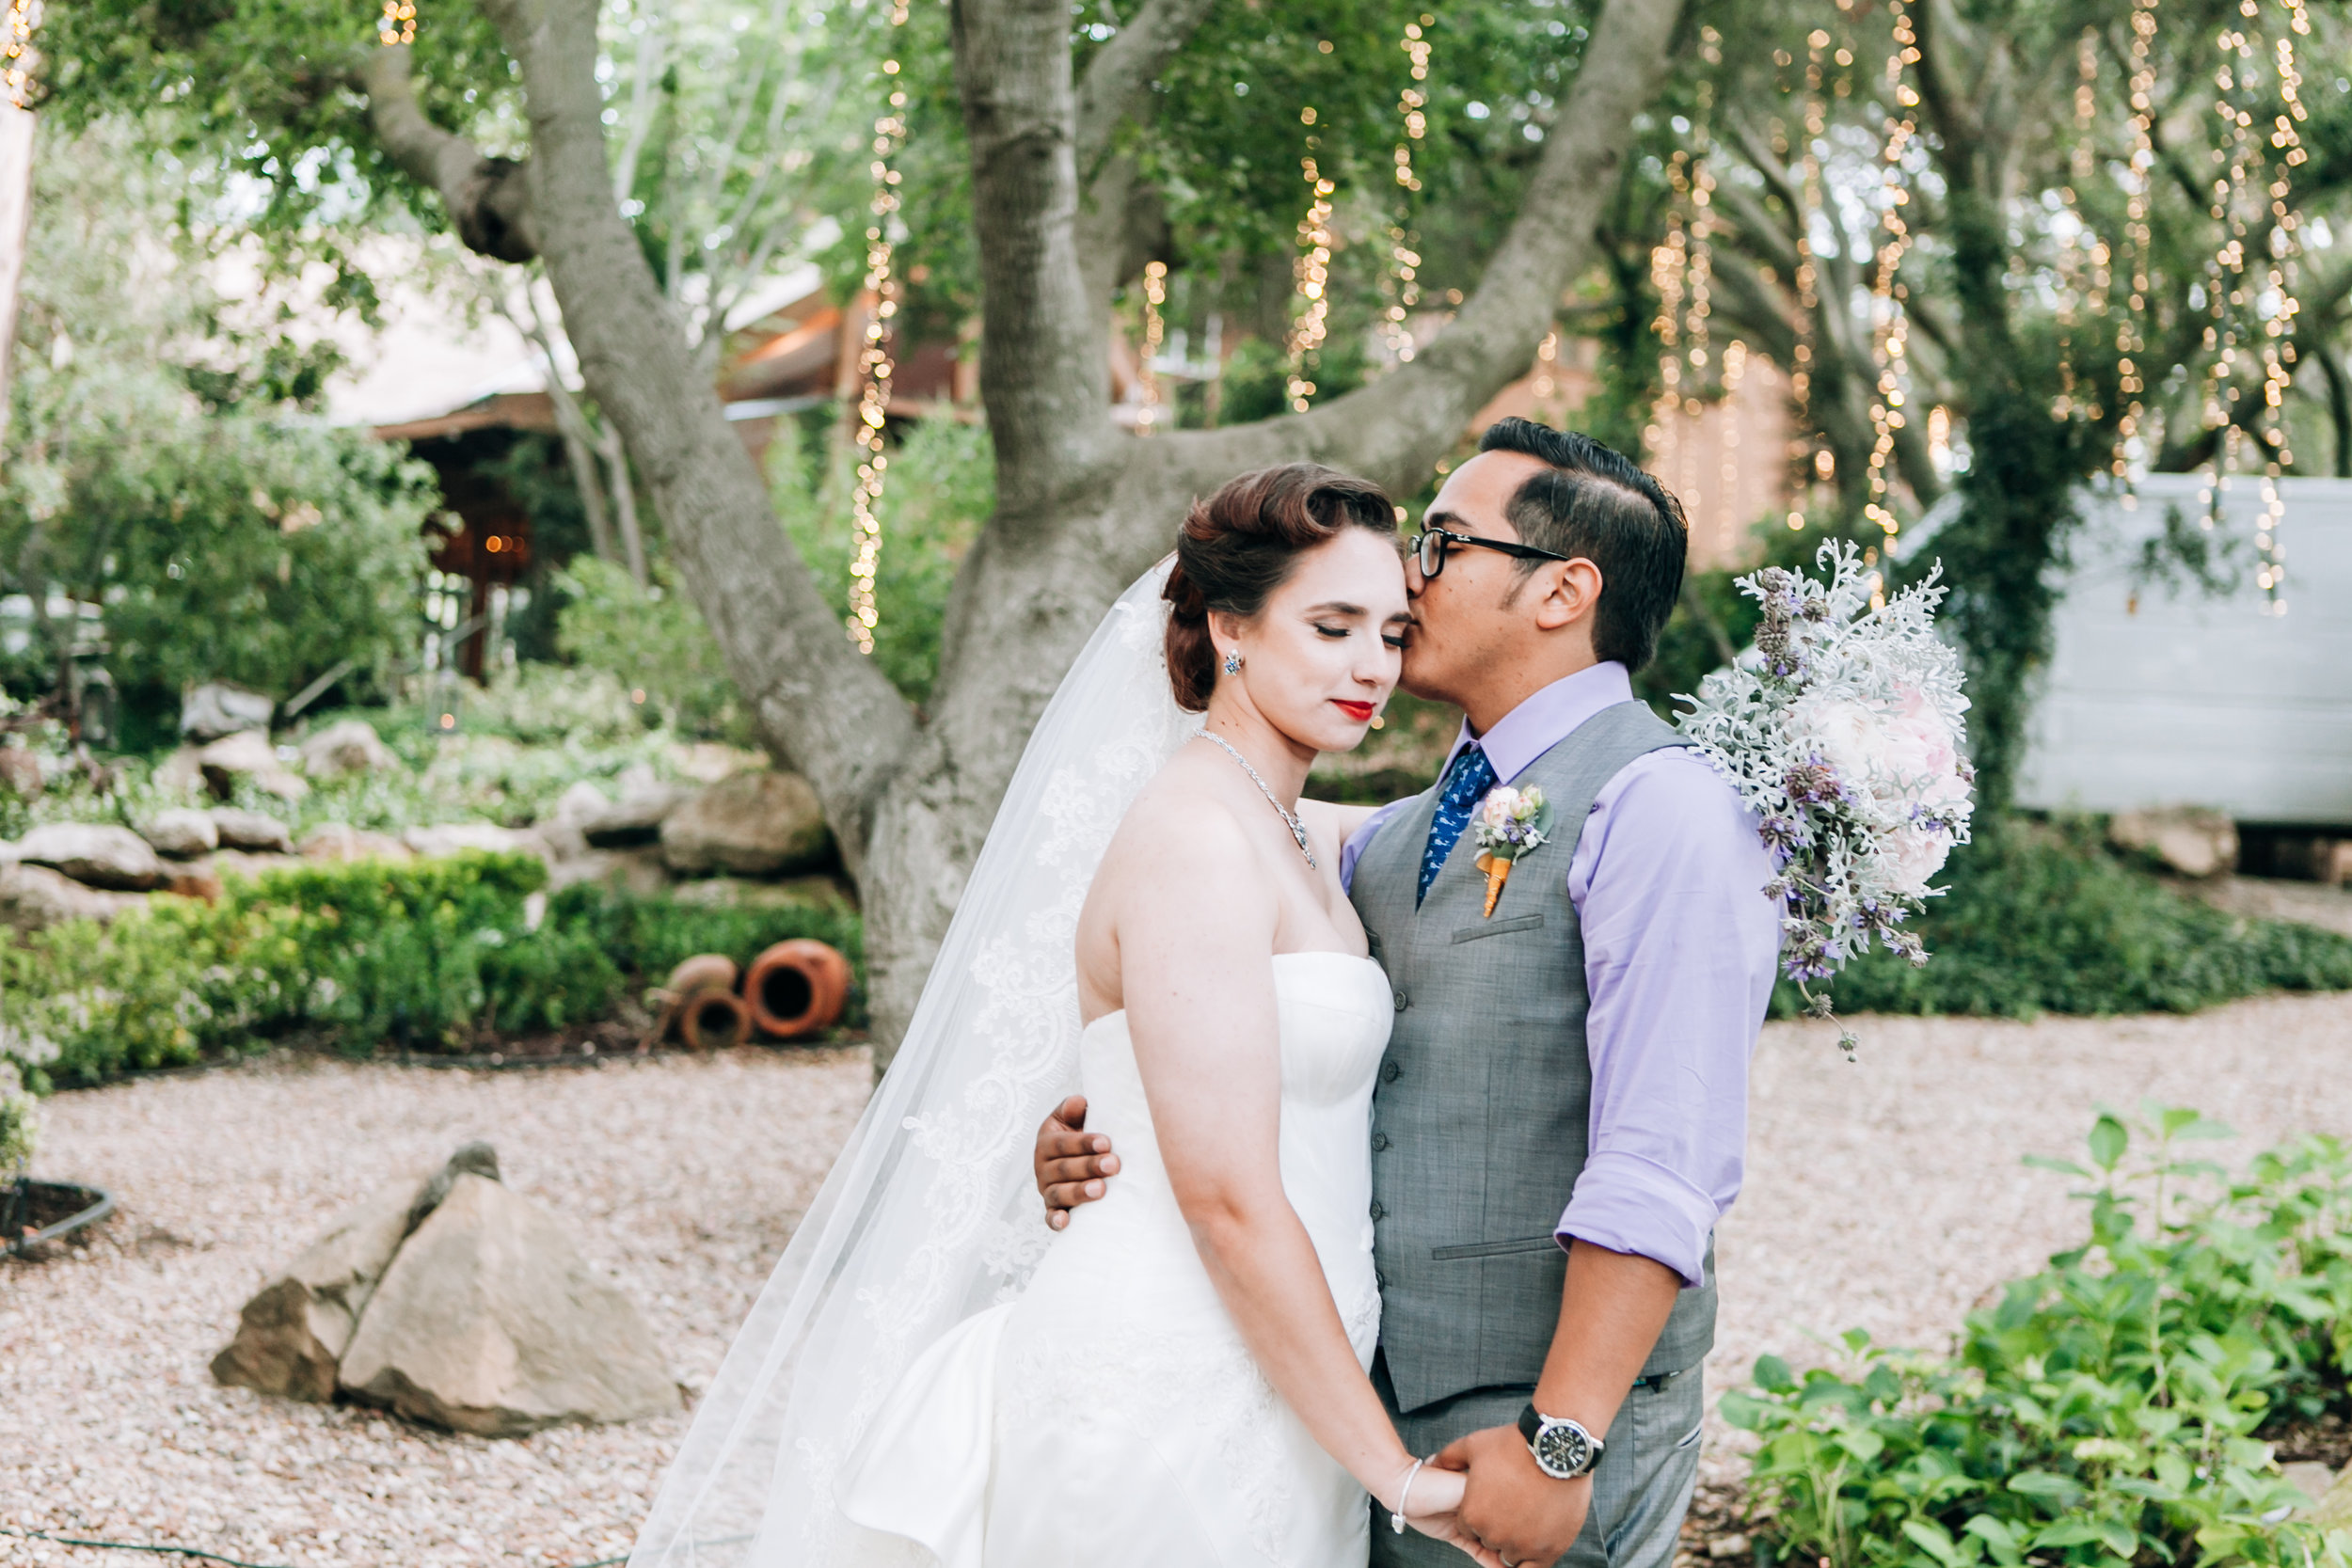 KaraNixonWeddings-Malibu-Wedding-54.jpg